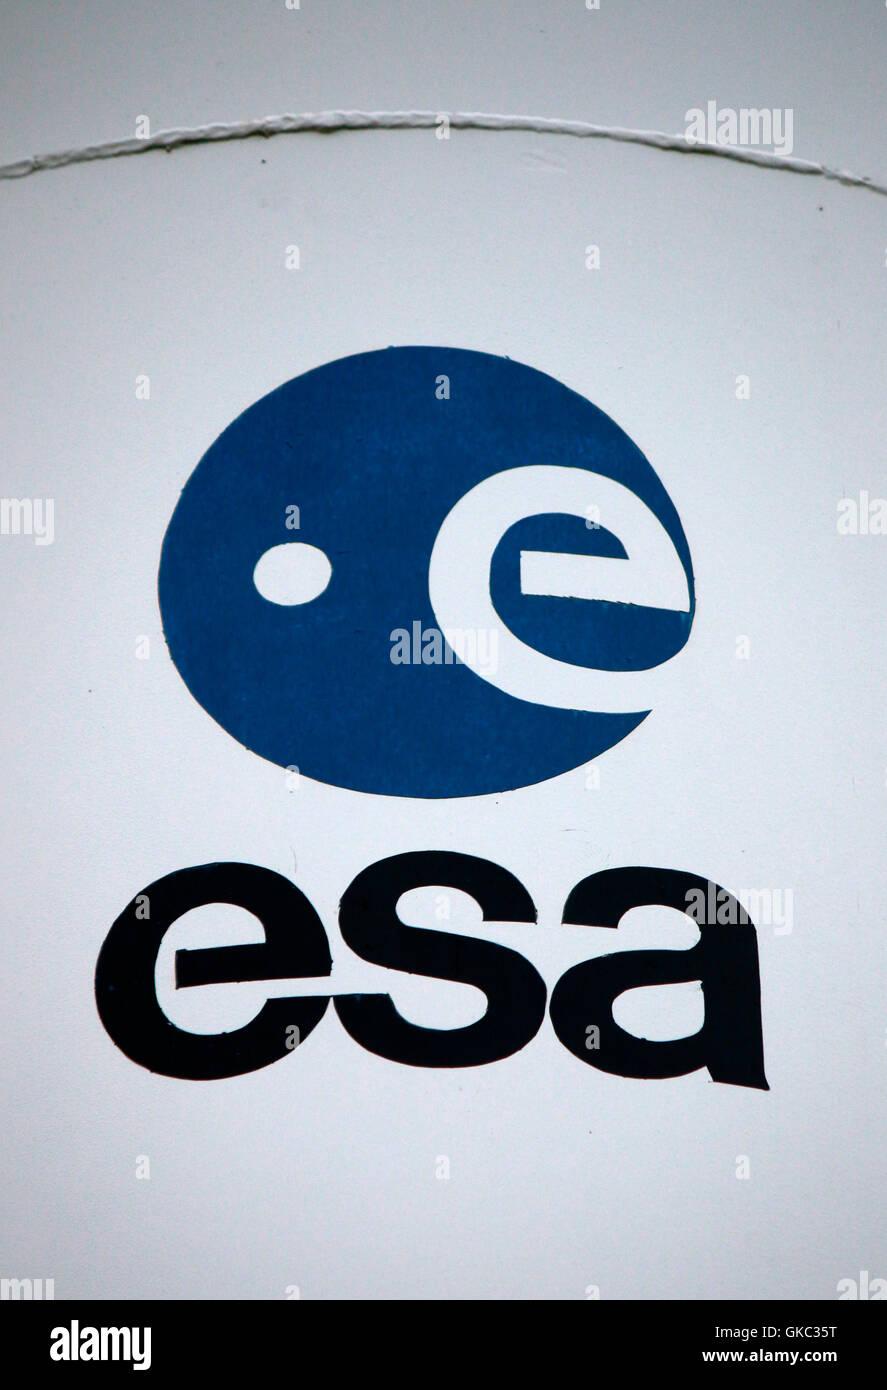 Logo der Marke 'ESA European Space Agency', Kiruna, Schweden. - Stock Image